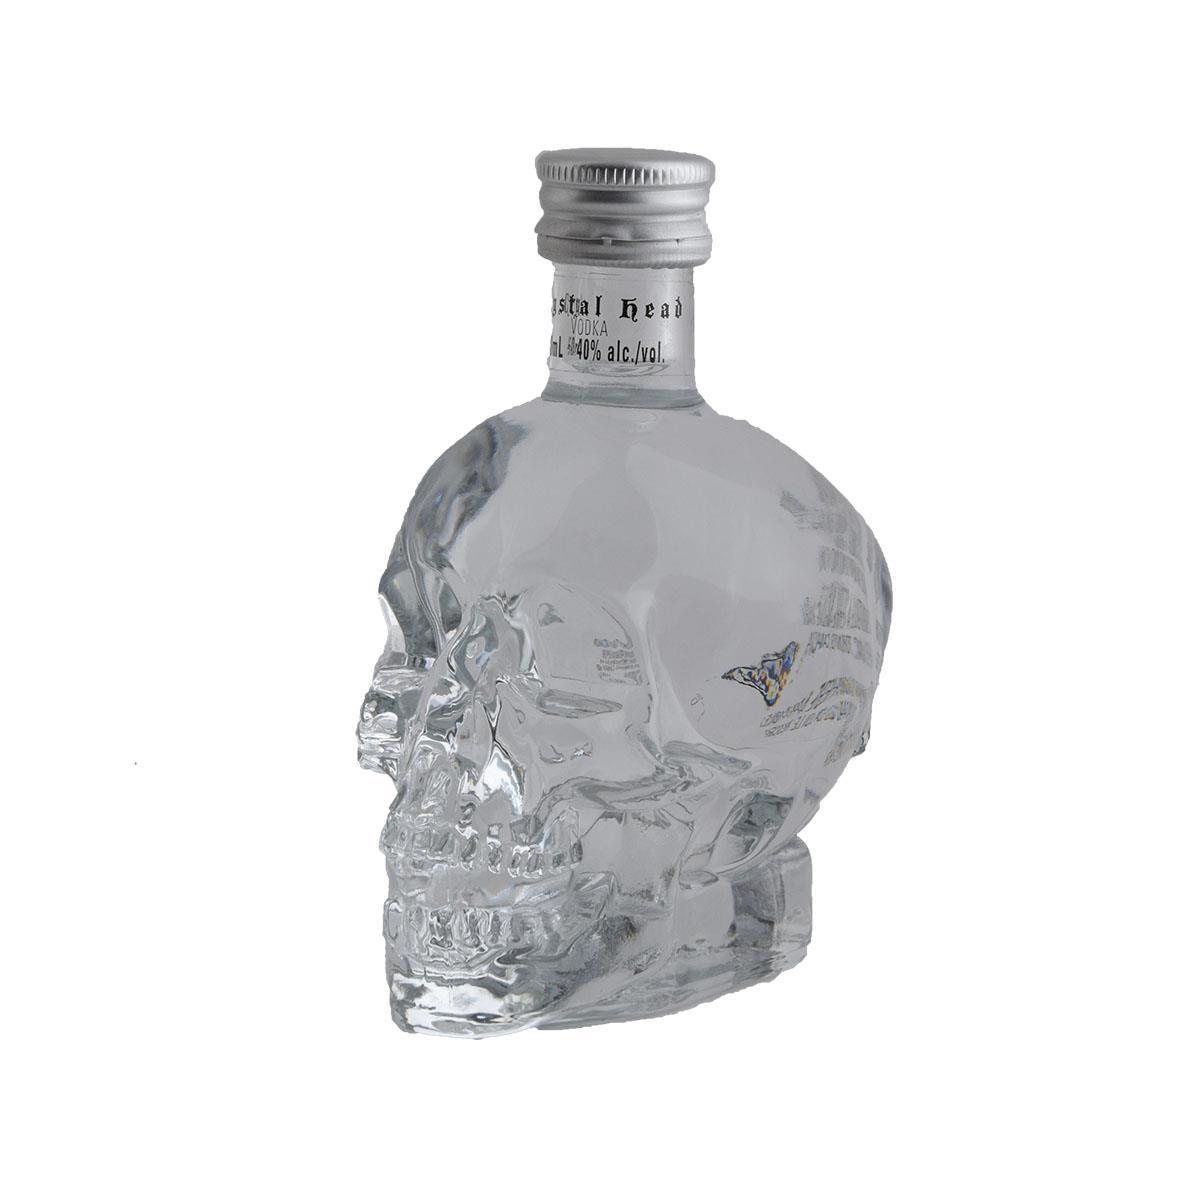 Crystal Head Βότκα 50ml